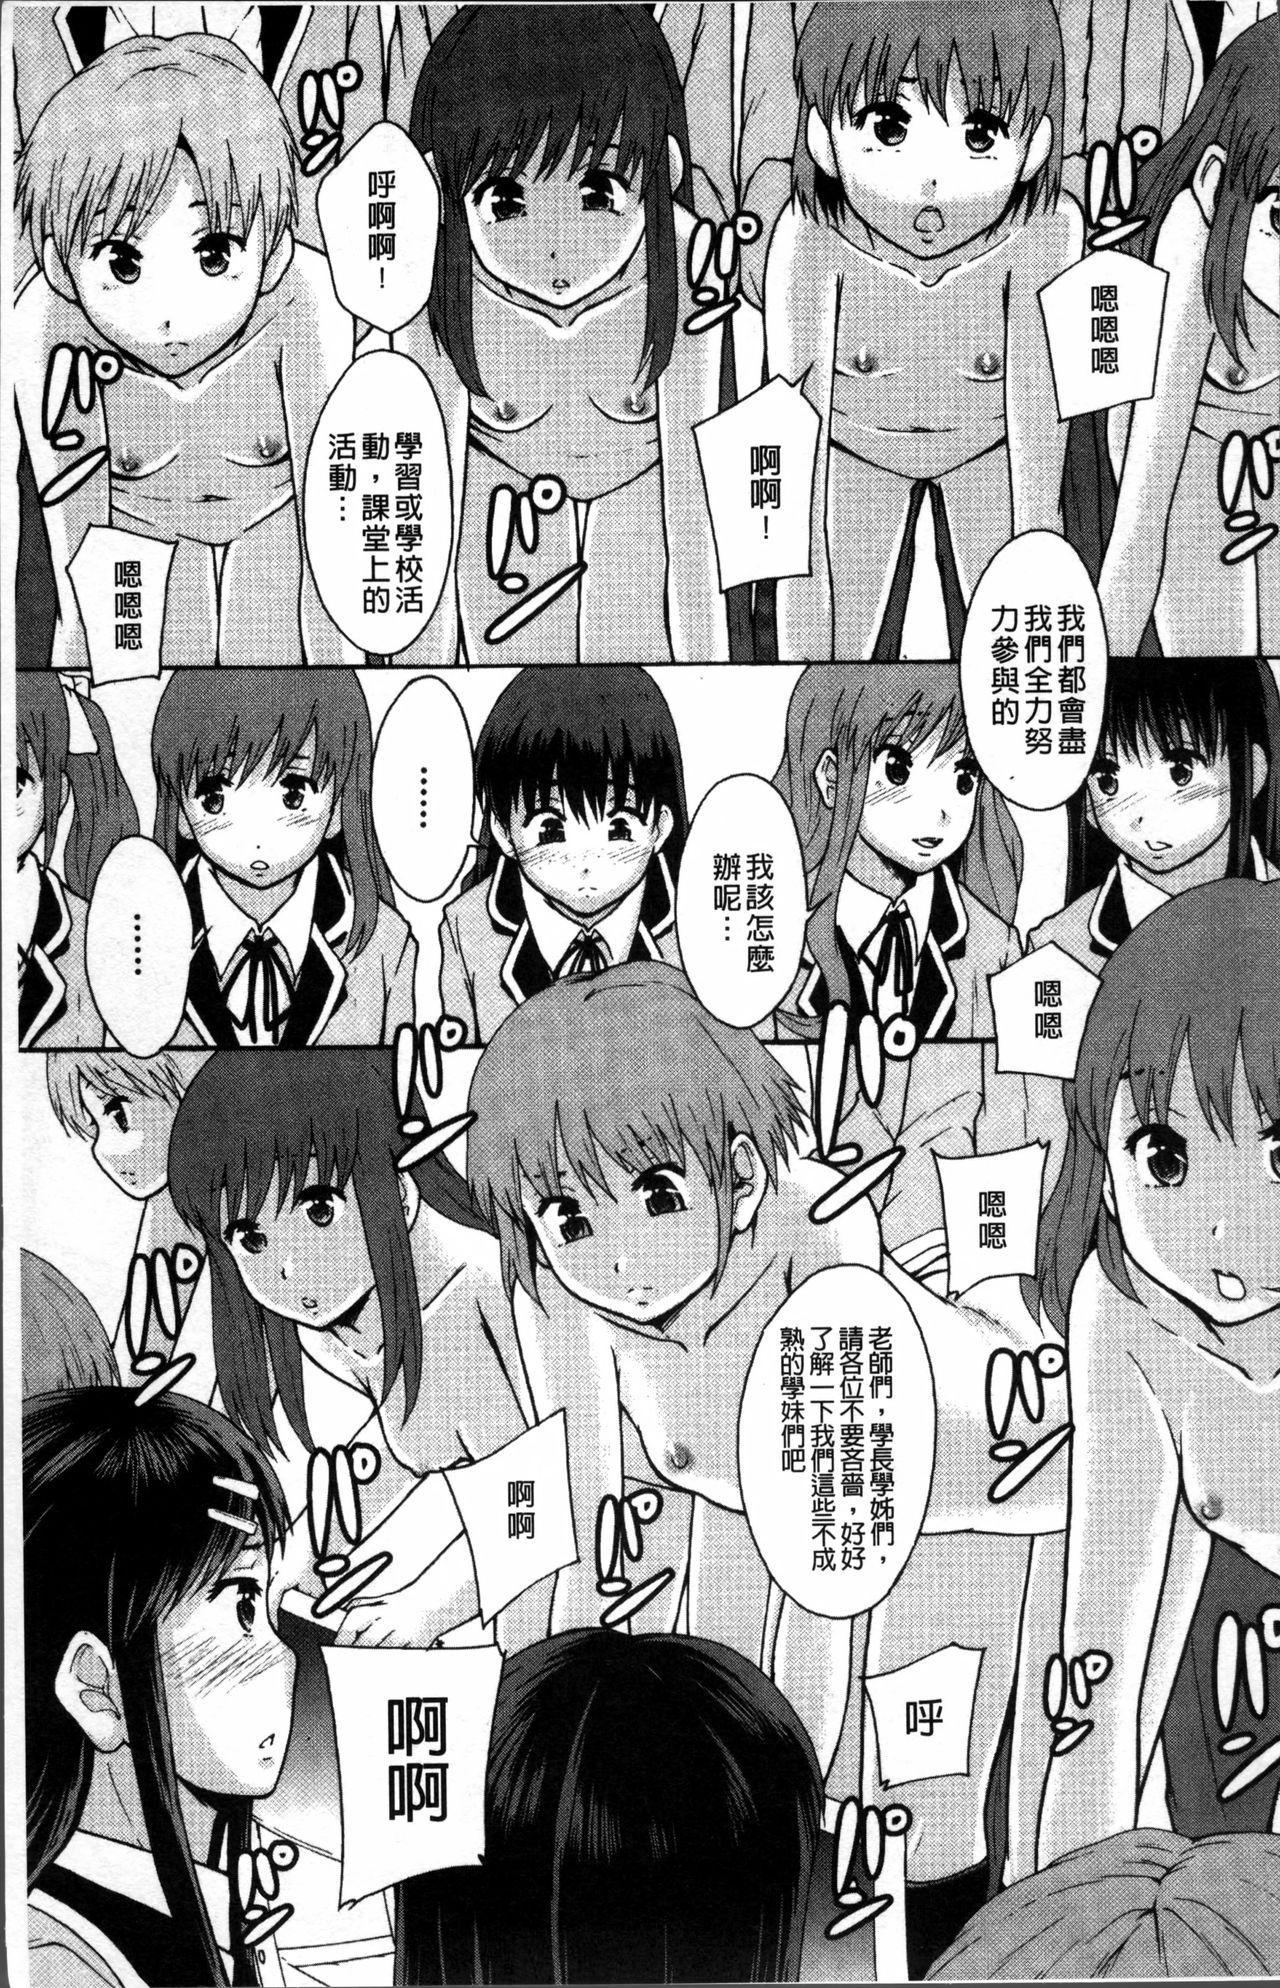 Anoko no Class wa AV-ka 17